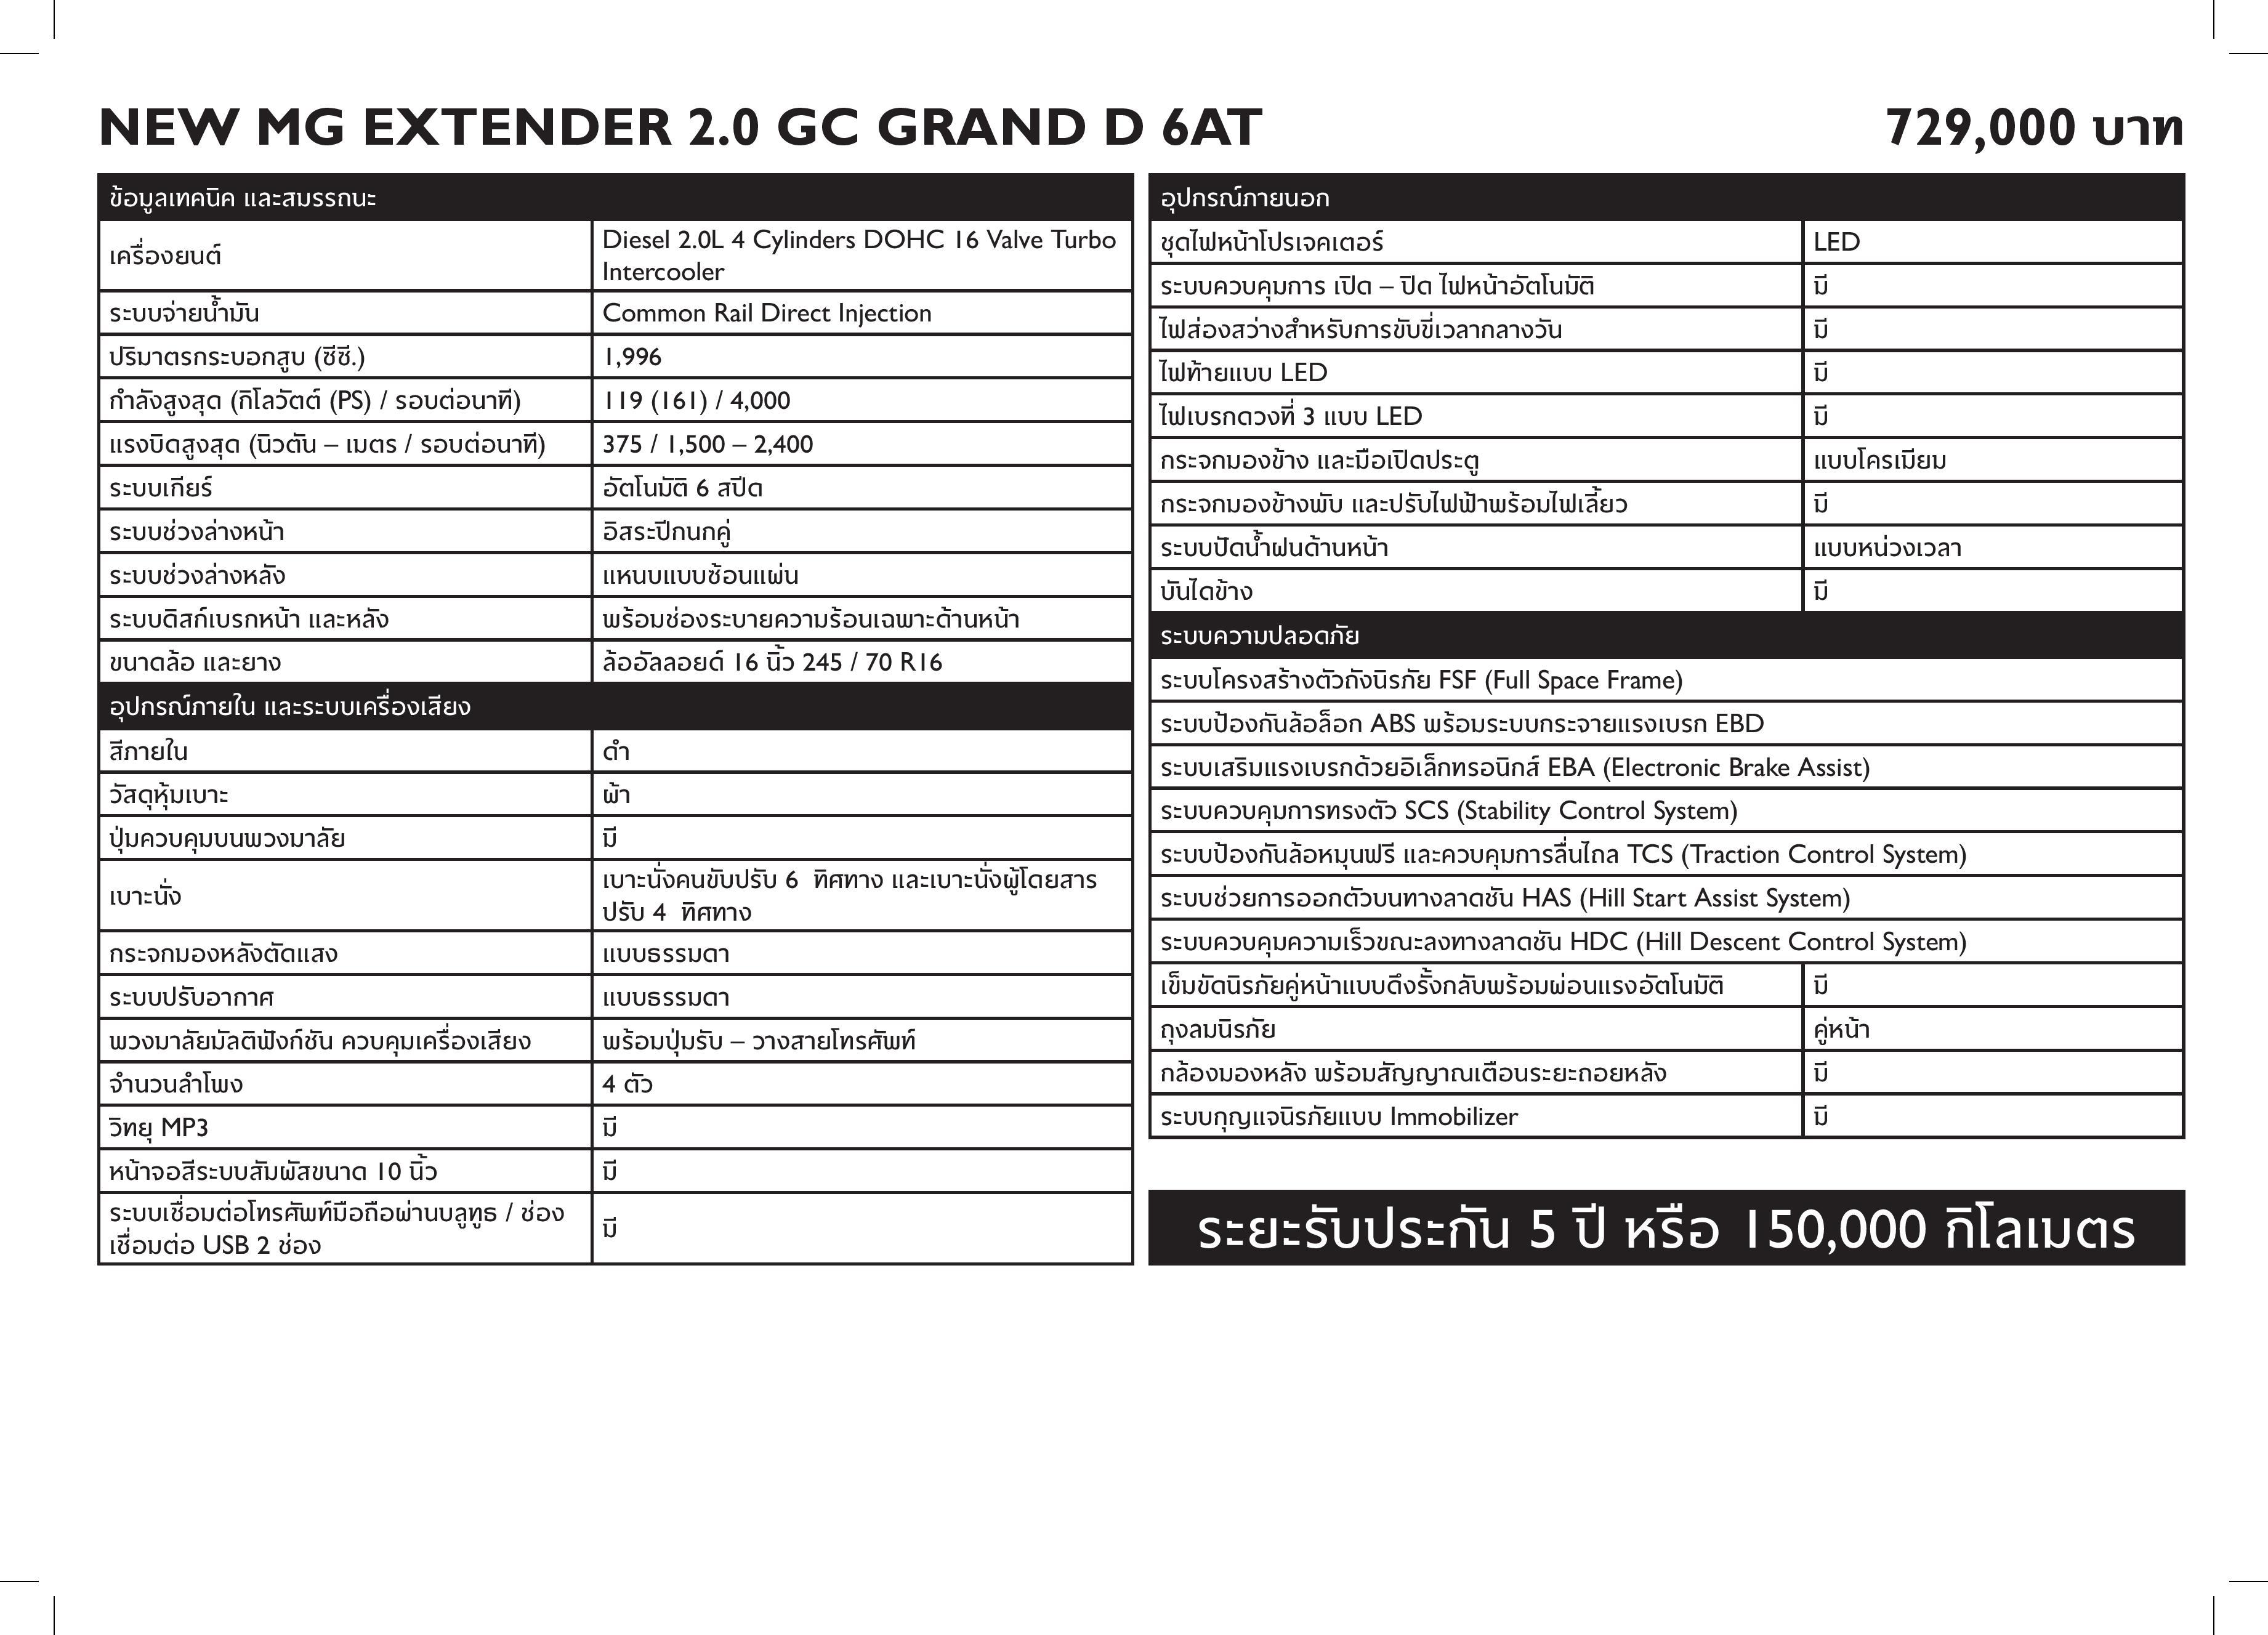 MG - NEW MG EXTENDER FL - Specsheet-page-005